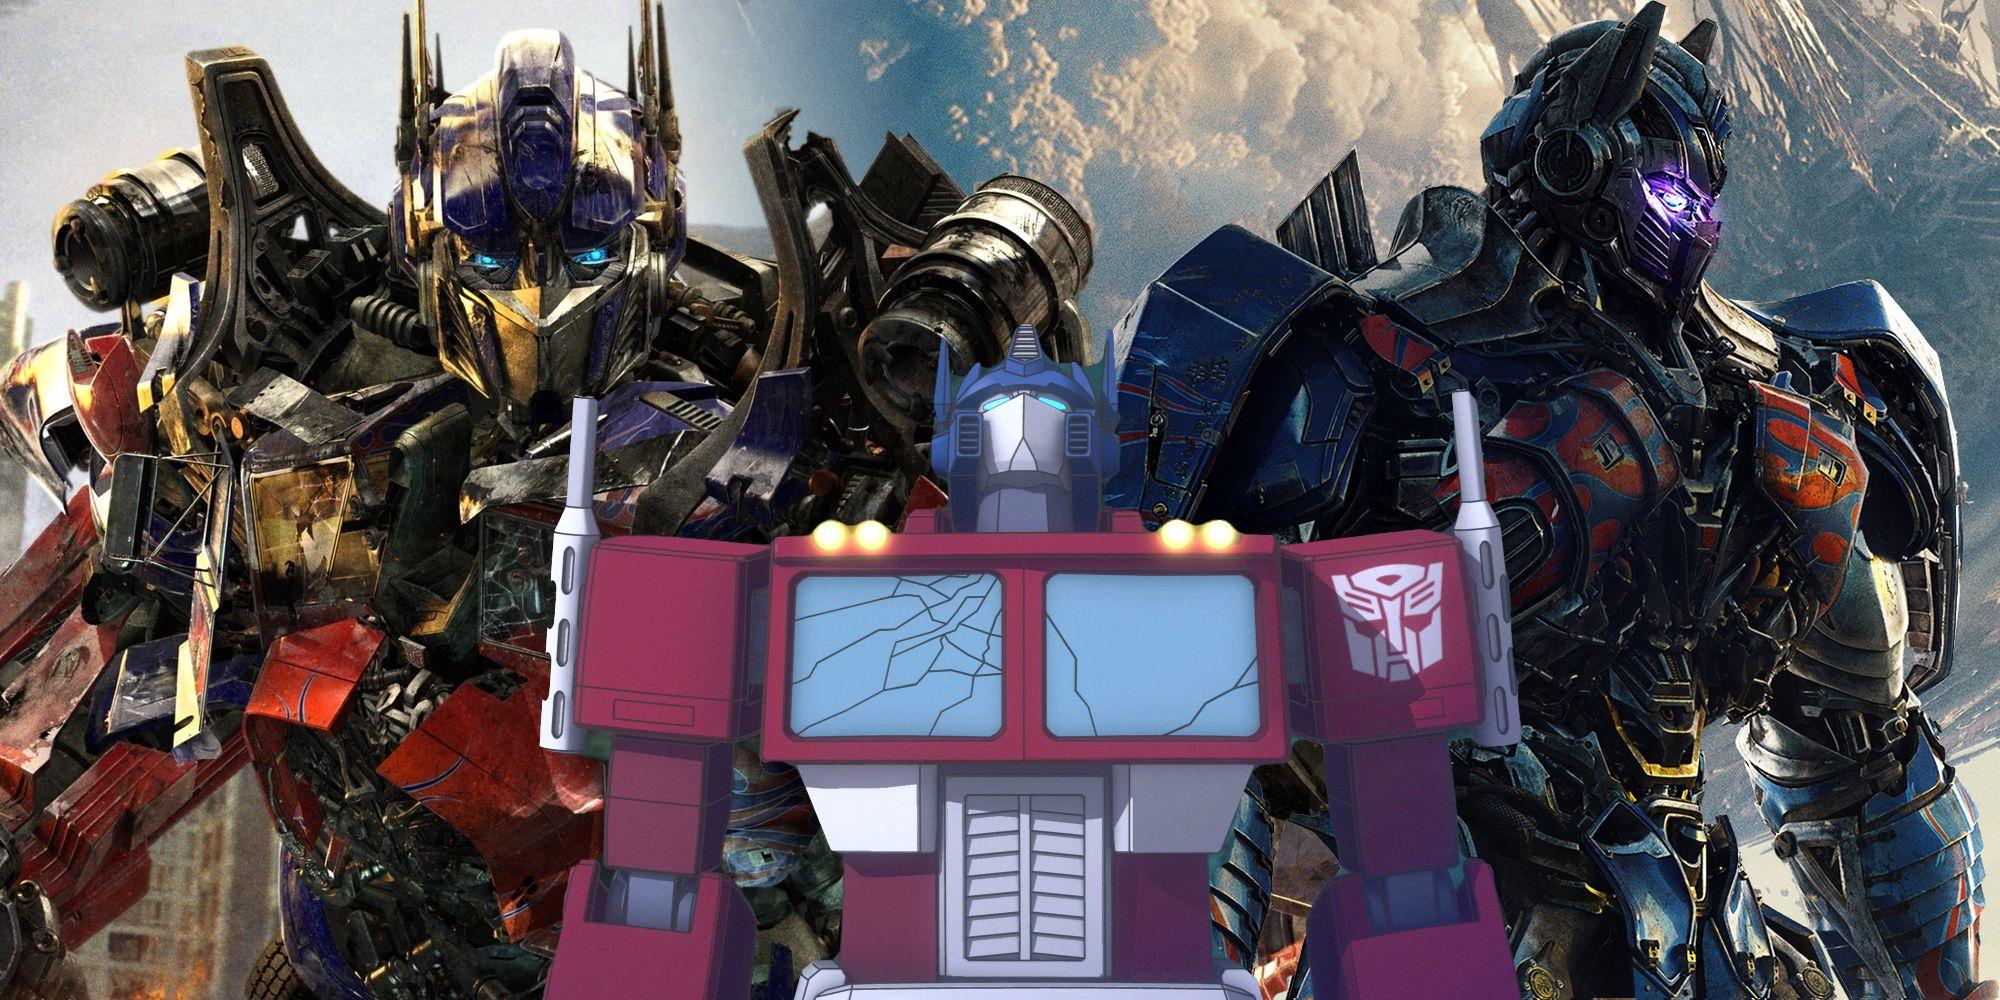 peter cullen on his career as optimus prime | screenrant